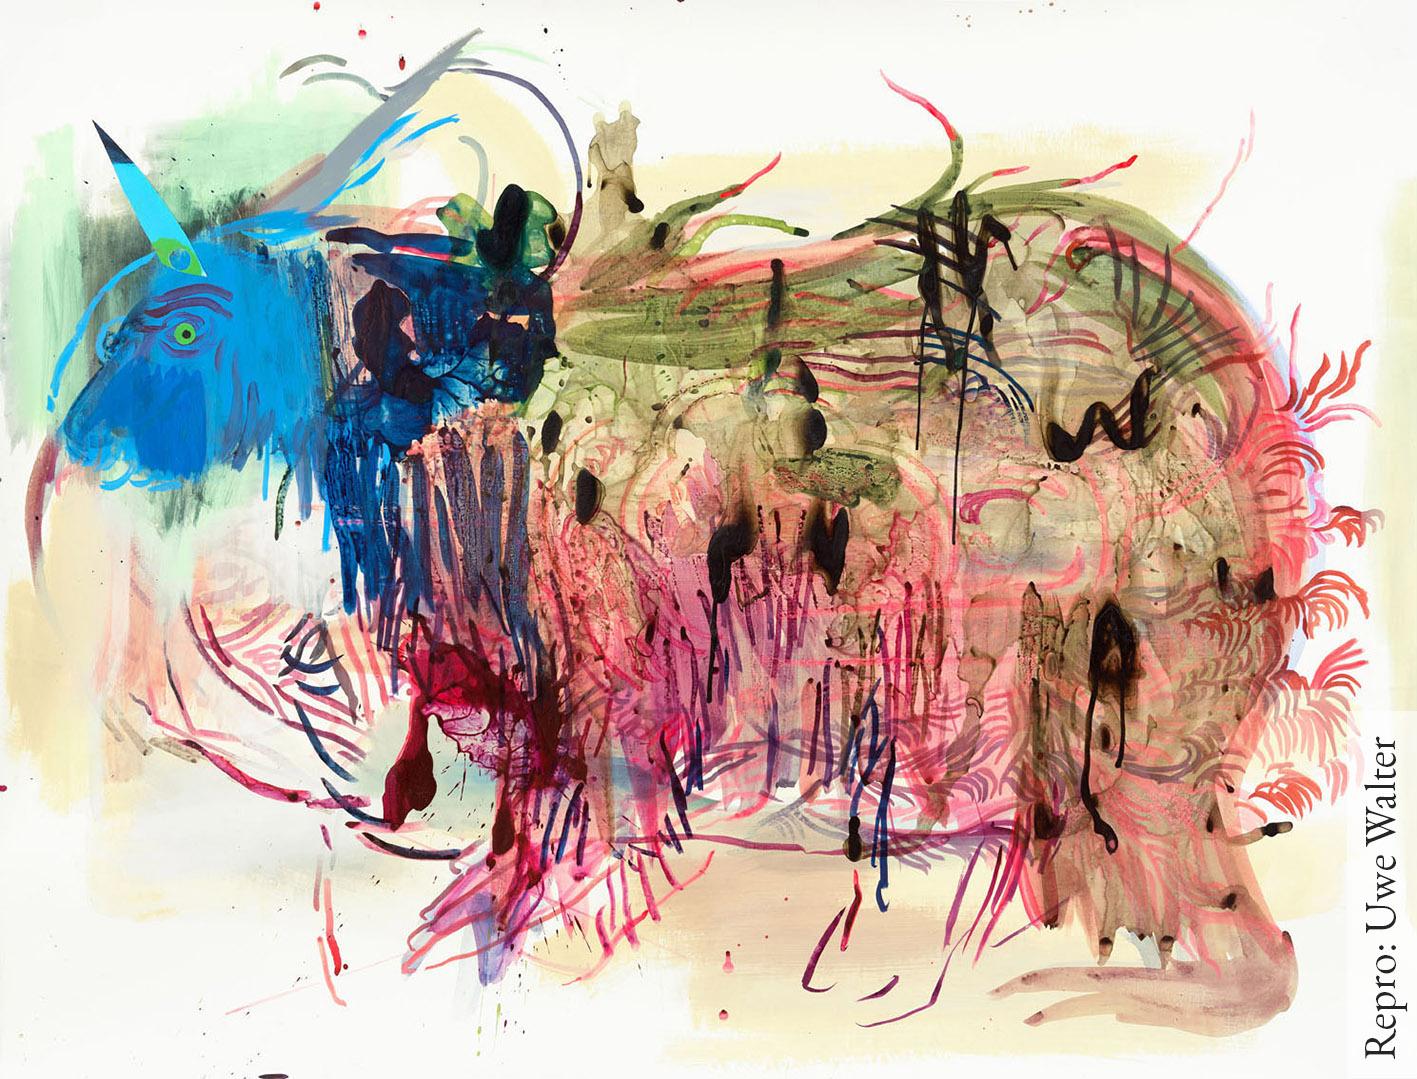 Kunstwerk, Repro: Uwe Walther